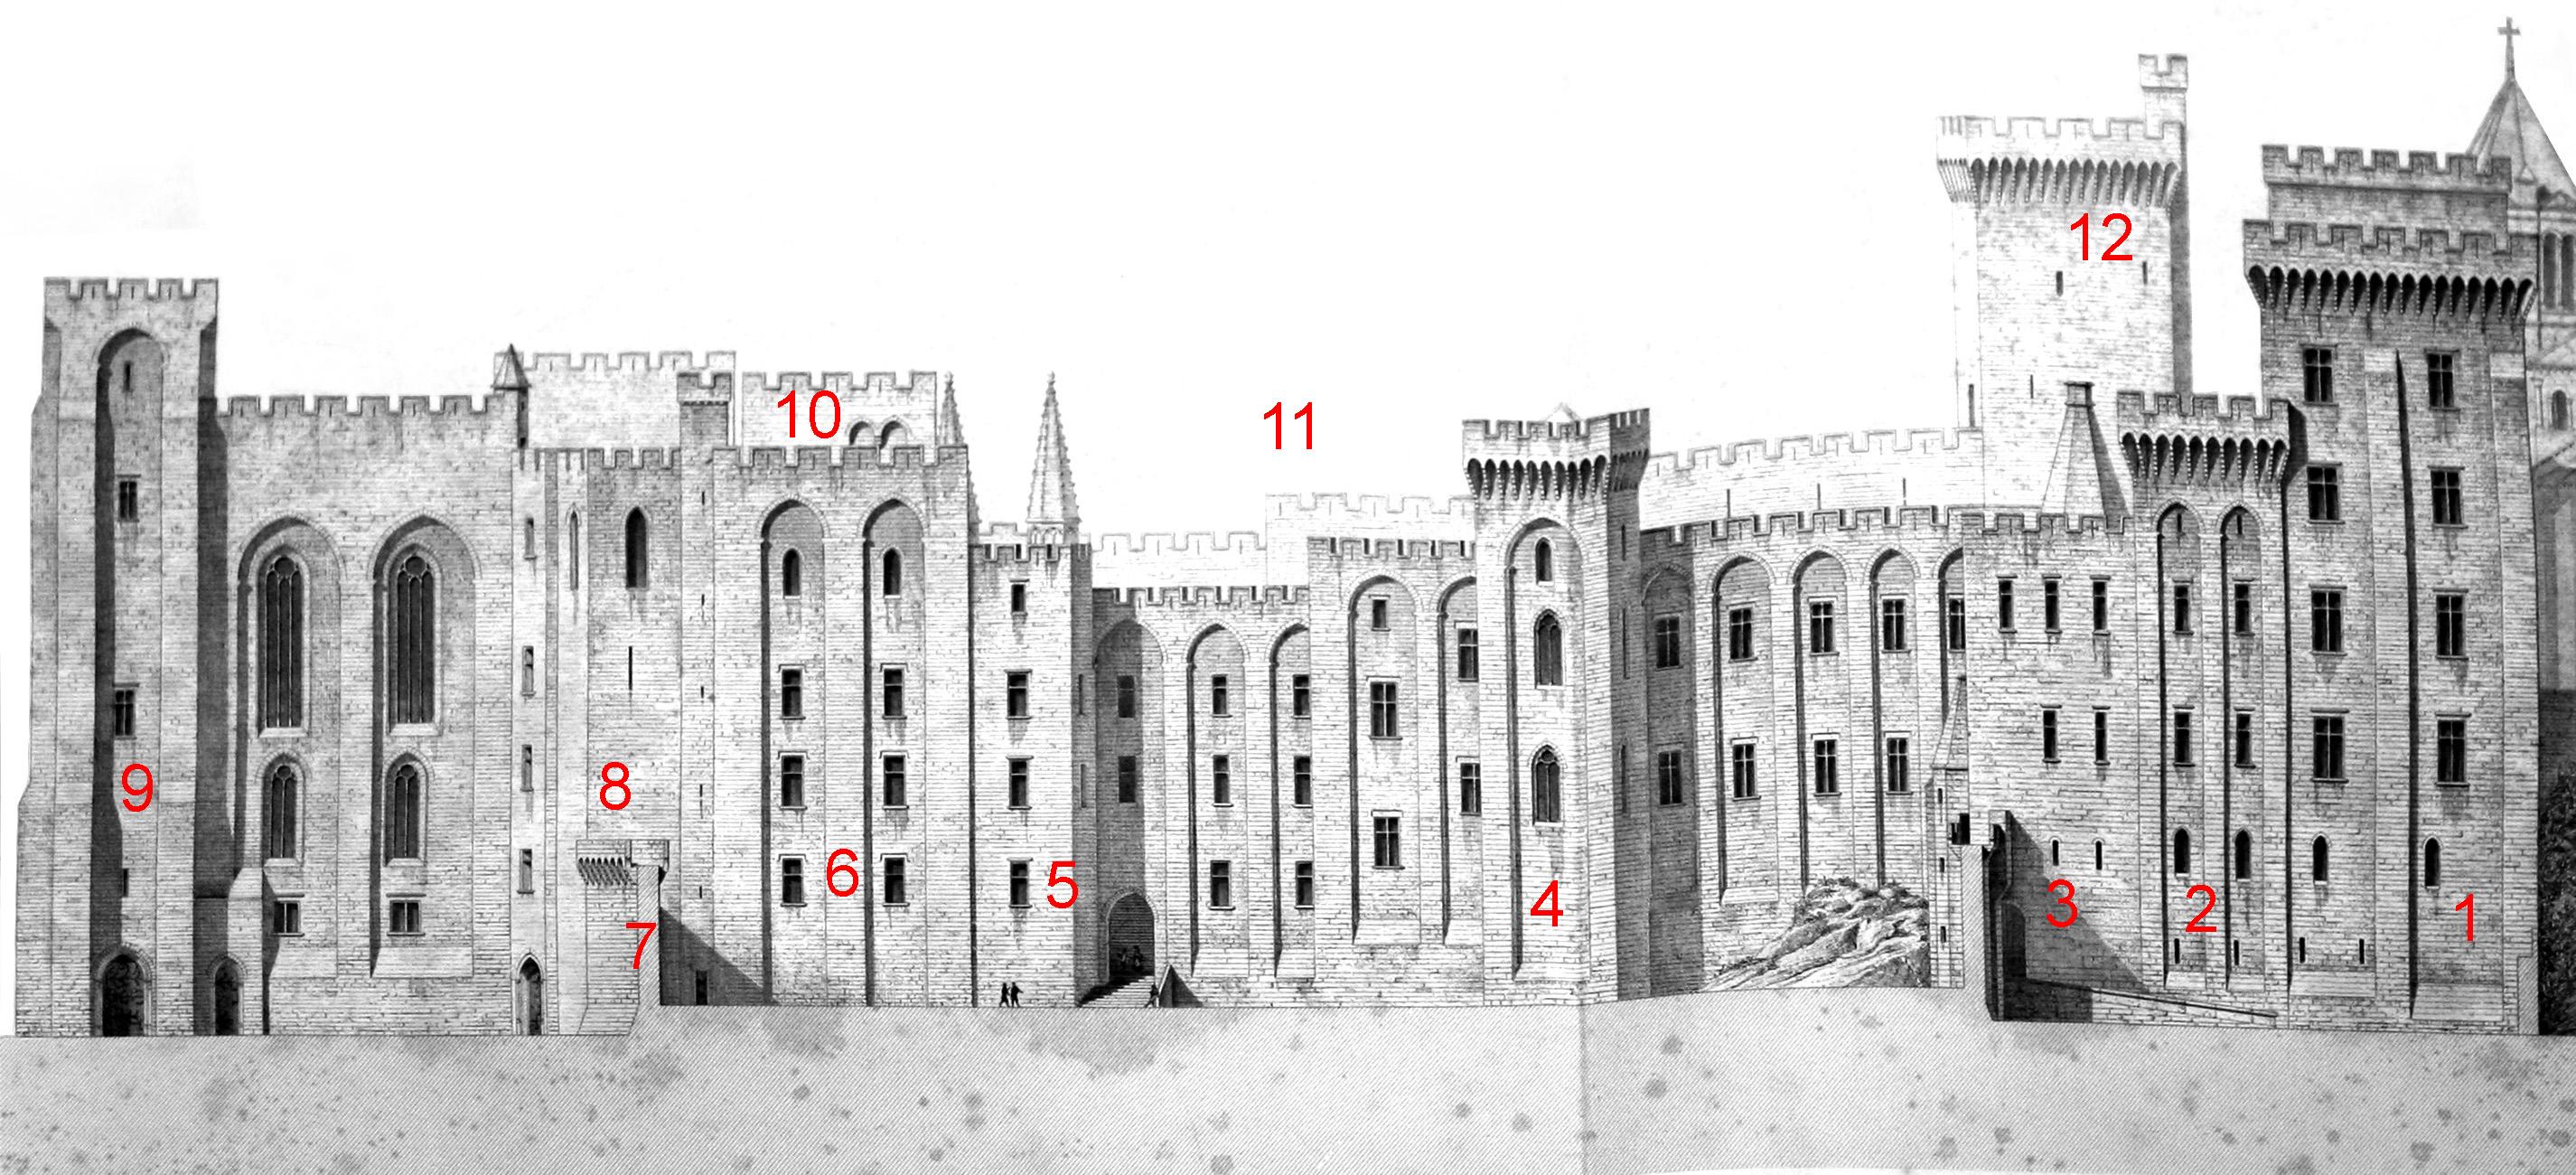 Historia de la Arquitectura. DISCURSO ARQUITECTÓNICO DE EUGÈNE VIOLLET-LE-DUC